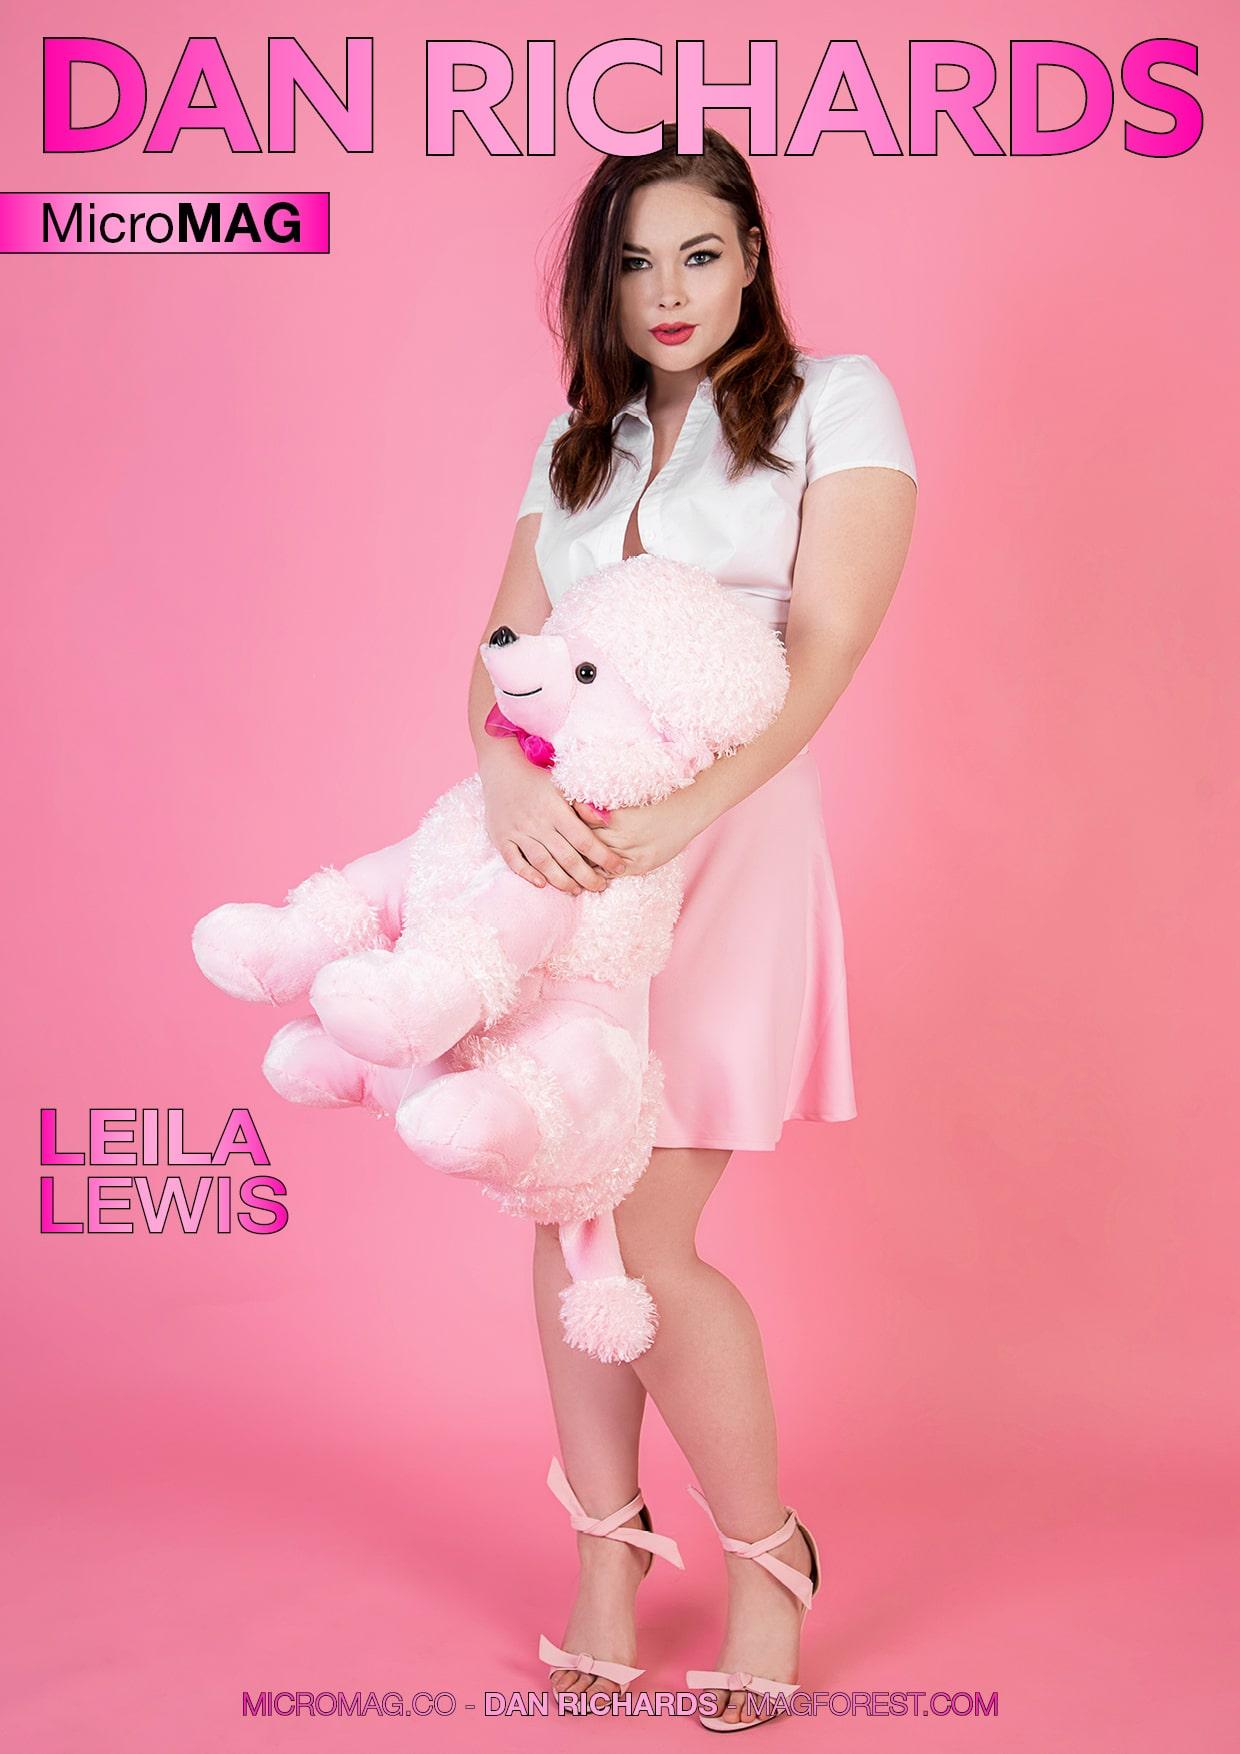 Dan Richards MicroMAG - Leila Lewis - Issue 8